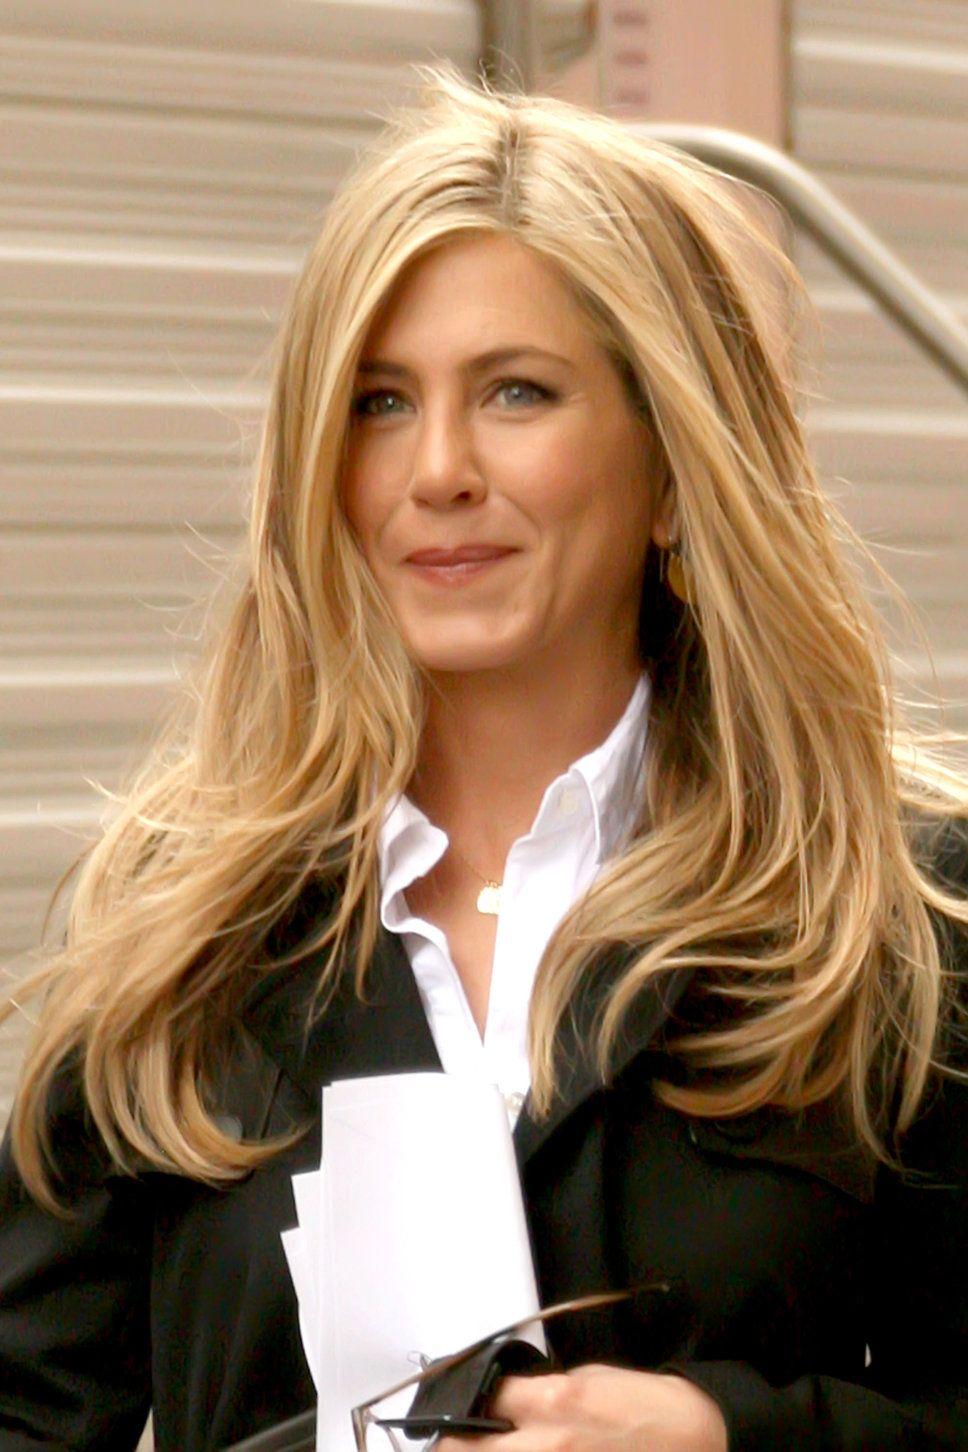 Jennifer Aniston white oxford shirt black blazer honey colored long blonde hair straight styled